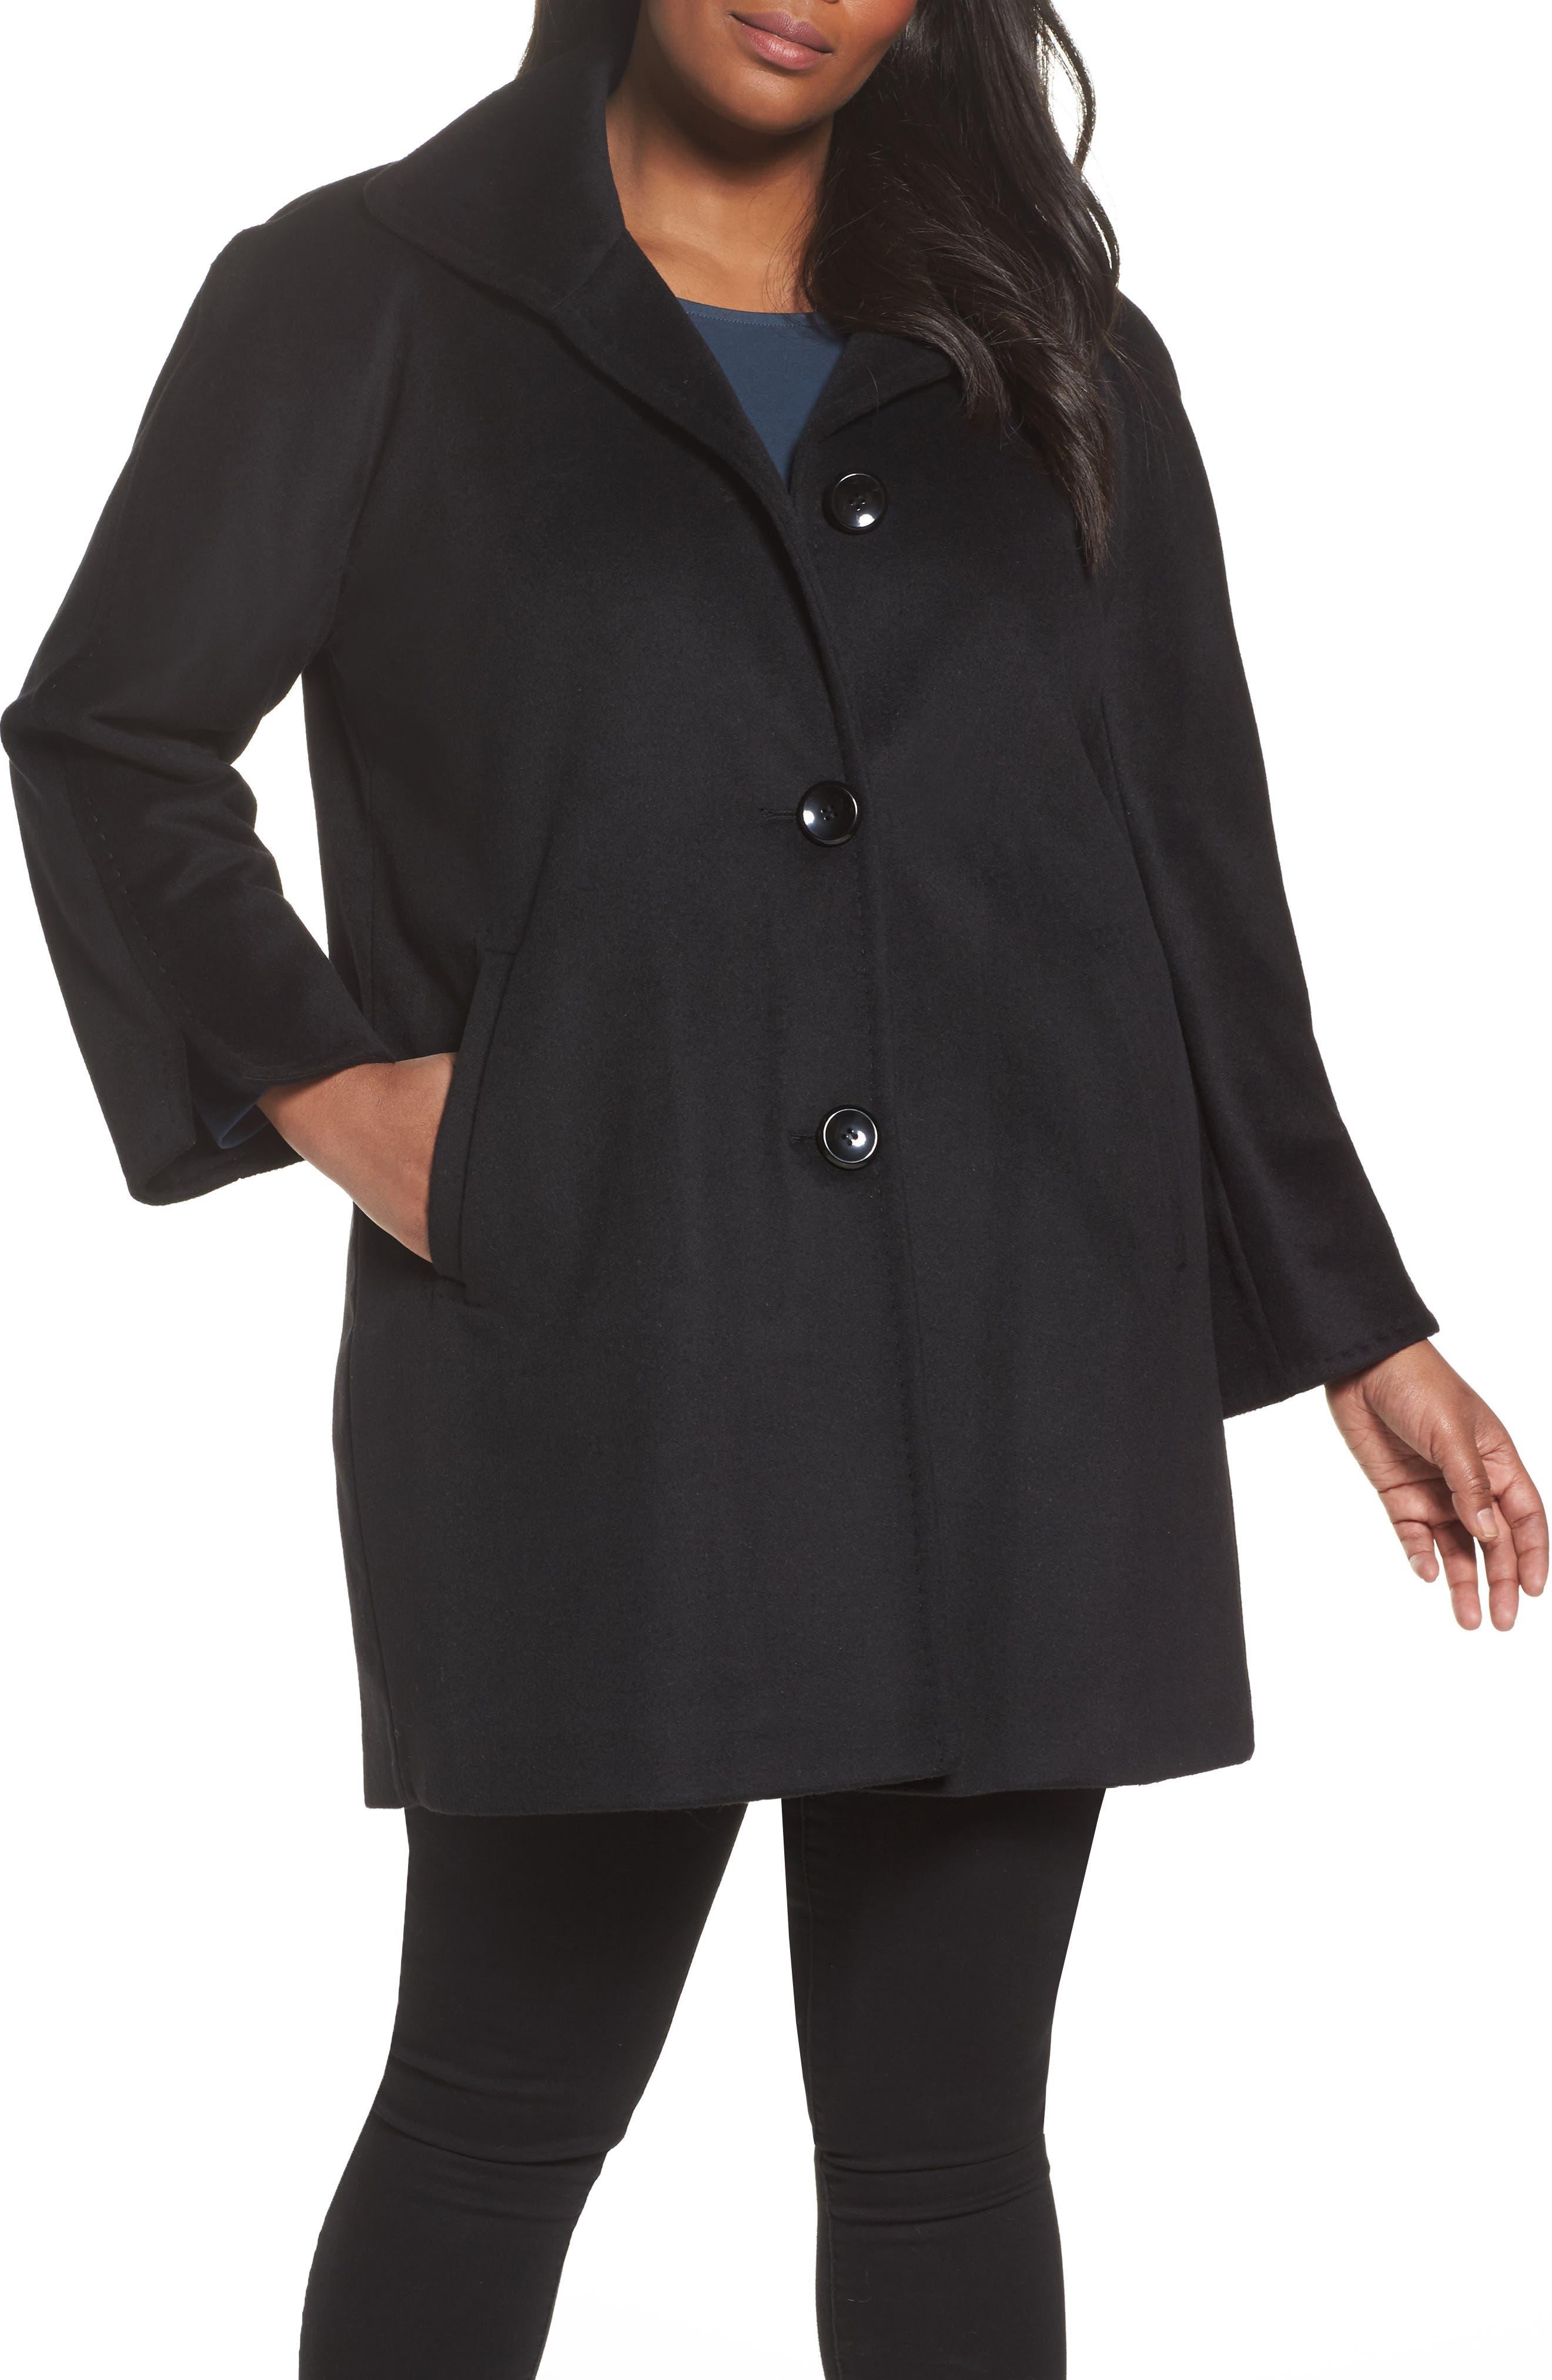 Kimono Wool Blend Coat,                         Main,                         color, Black